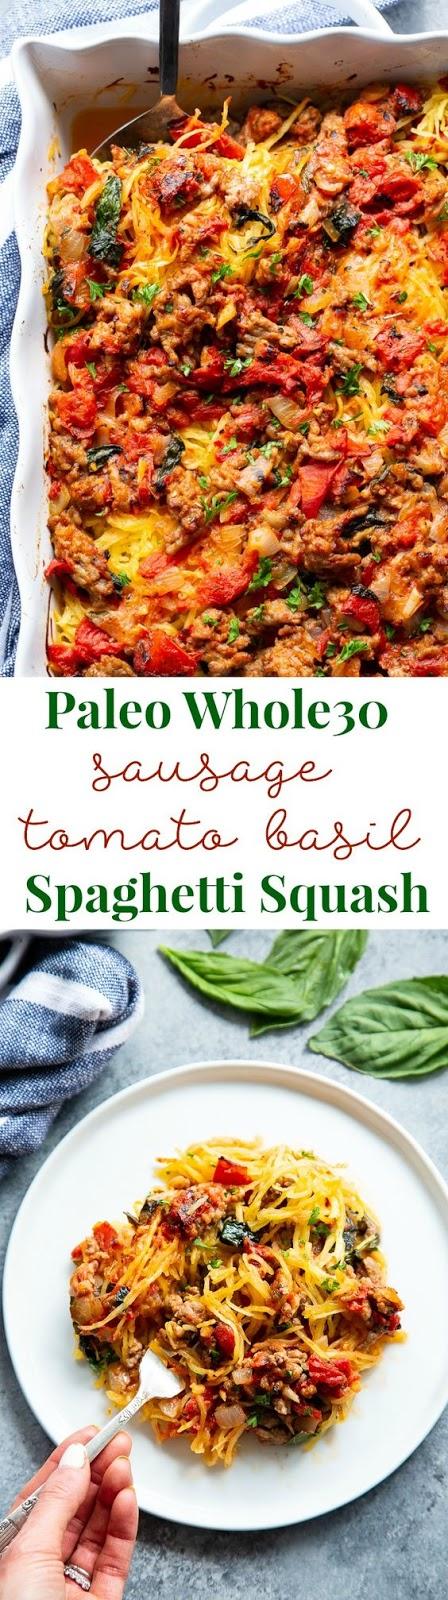 Keto Creamy Sausage Tomato Basil Spaghetti Squash